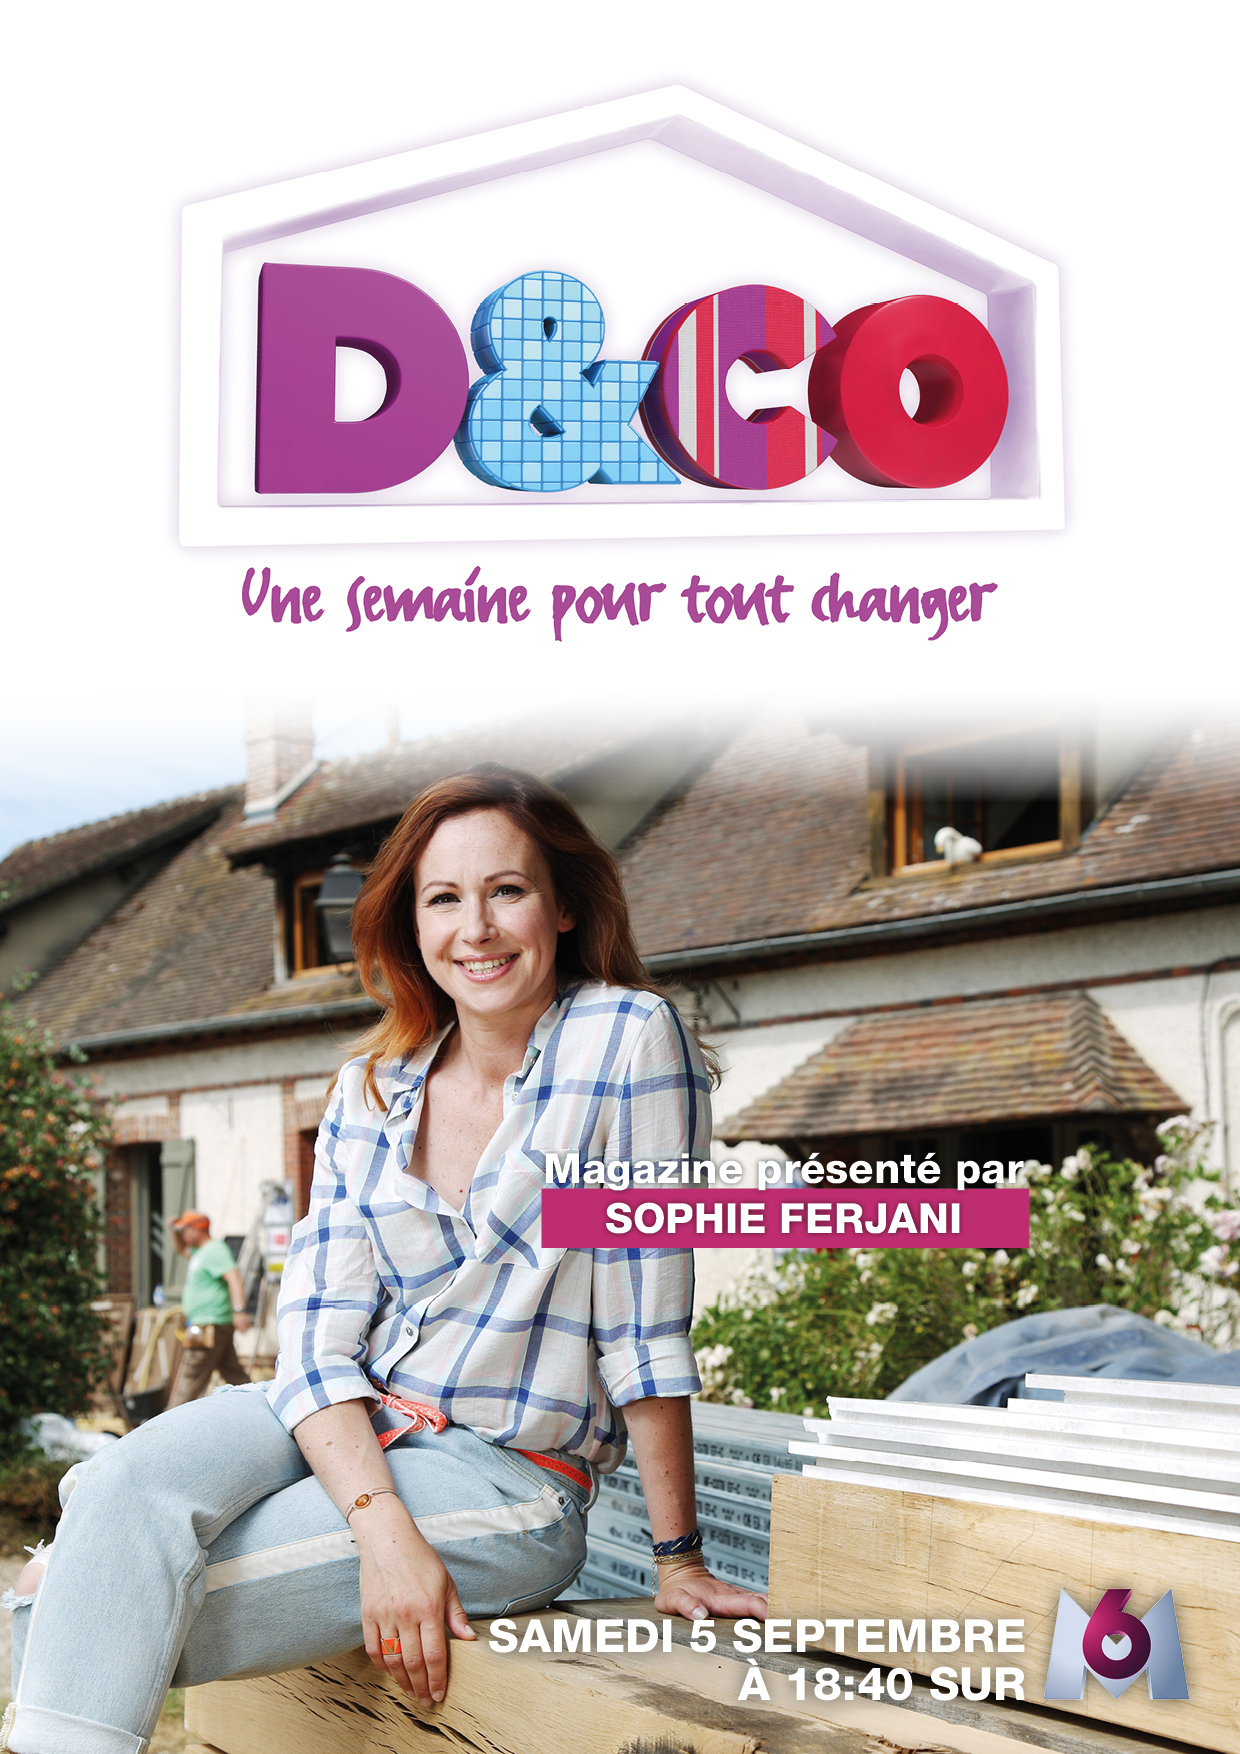 Sophie Ferjani Prend La T Te De D Co Decorer Sa